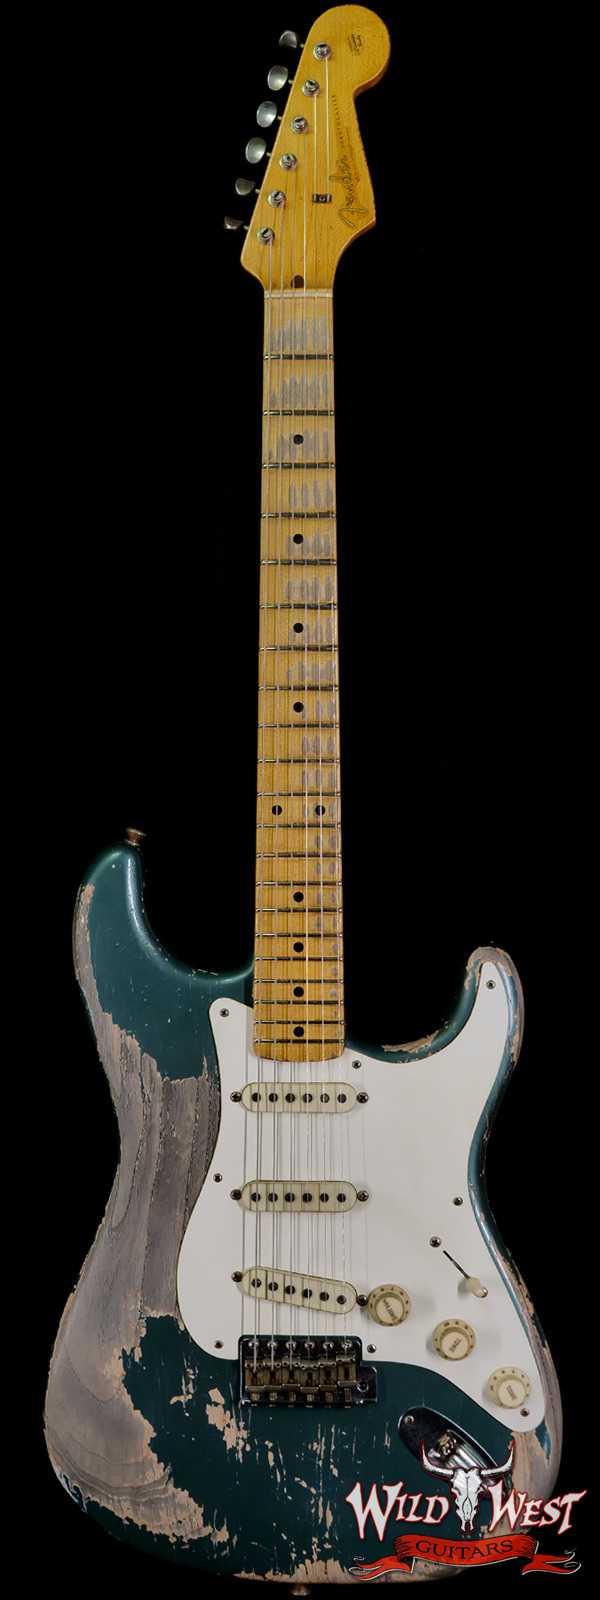 Fender Custom Shop Greg Fessler Masterbuilt 1957 Stratocaster Josefina H/W Pickups Heavy Relic Sherwood Green Metallic 7.00 LBS